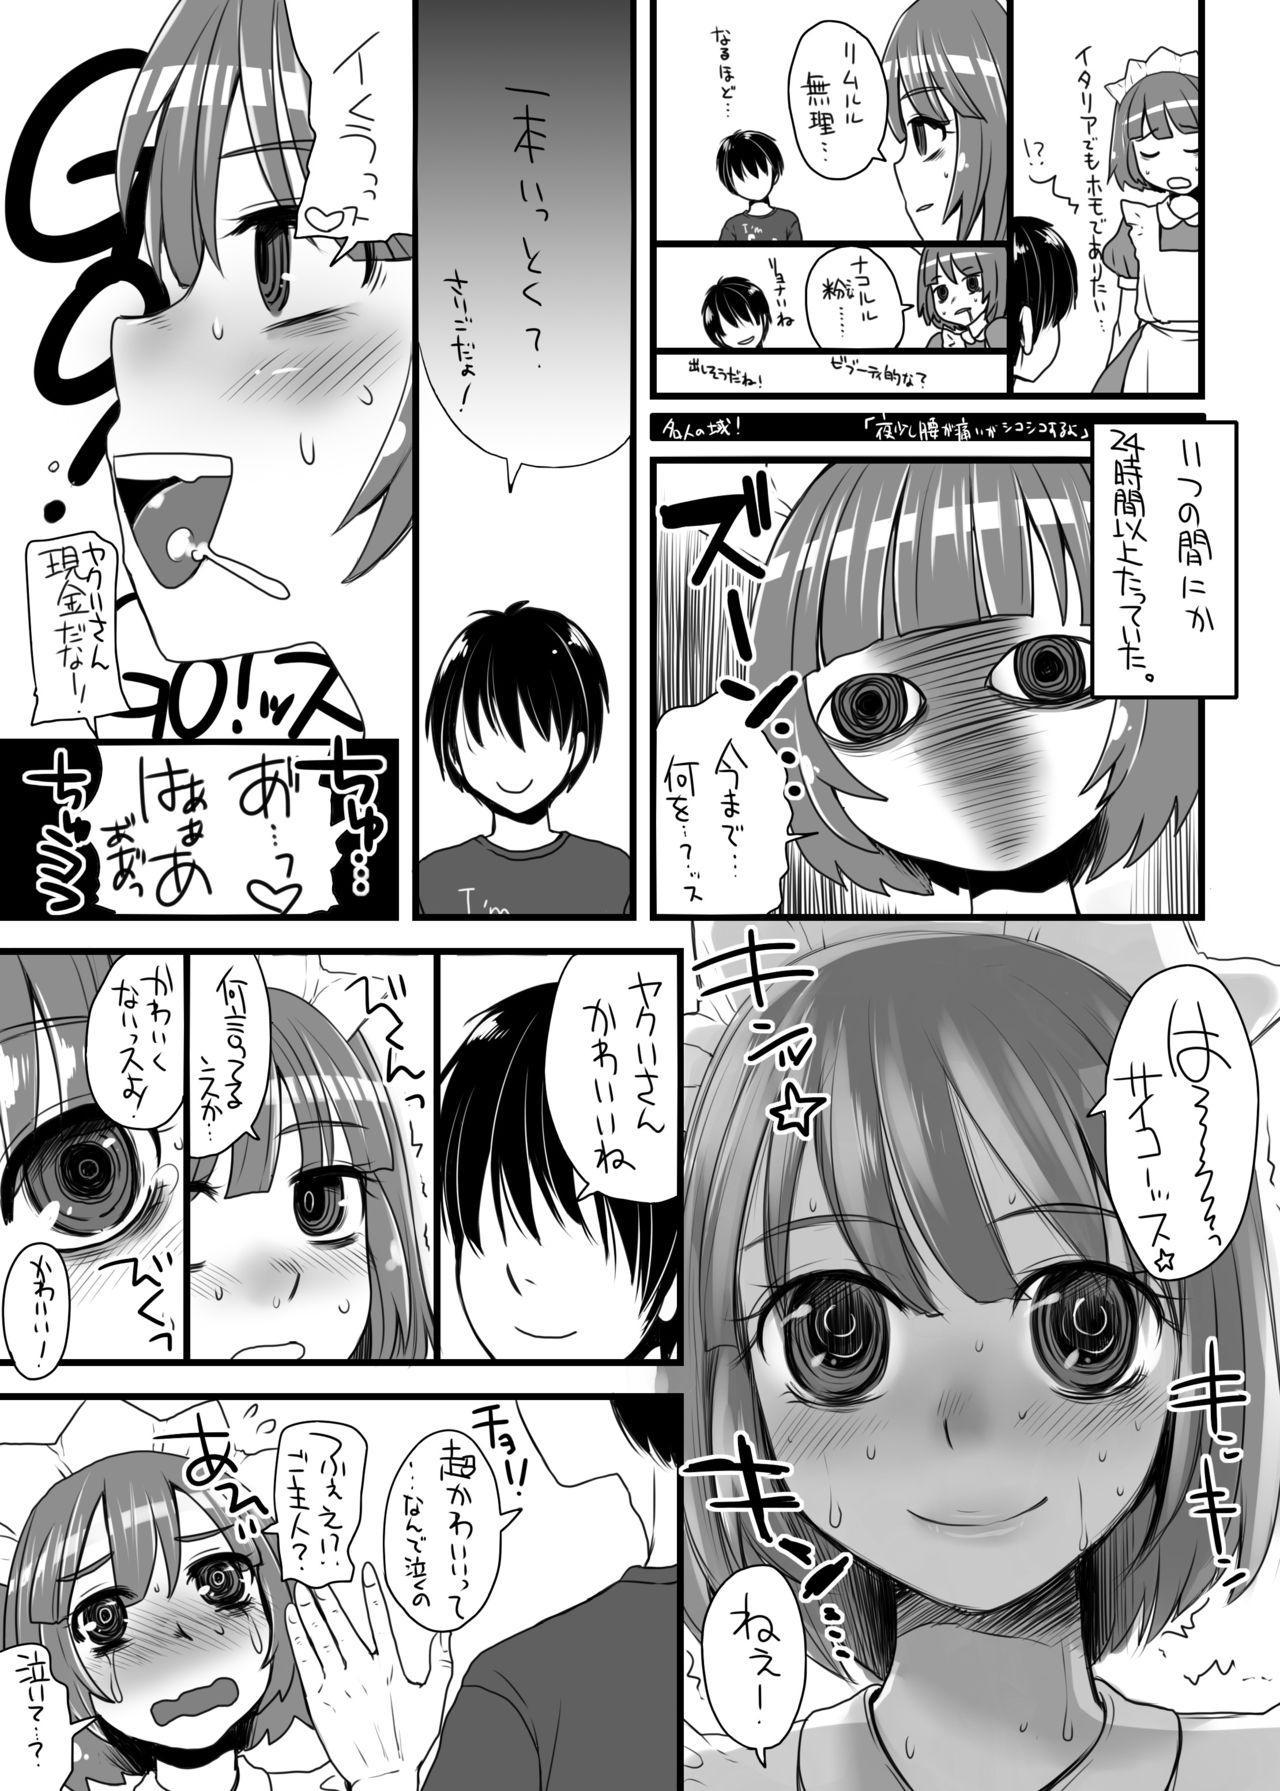 [Sarurururu (Doru Riheko)] Yakui-san Ero  Soushuuhen 2013-2016 (Nijiura Maids) [Digital] 11